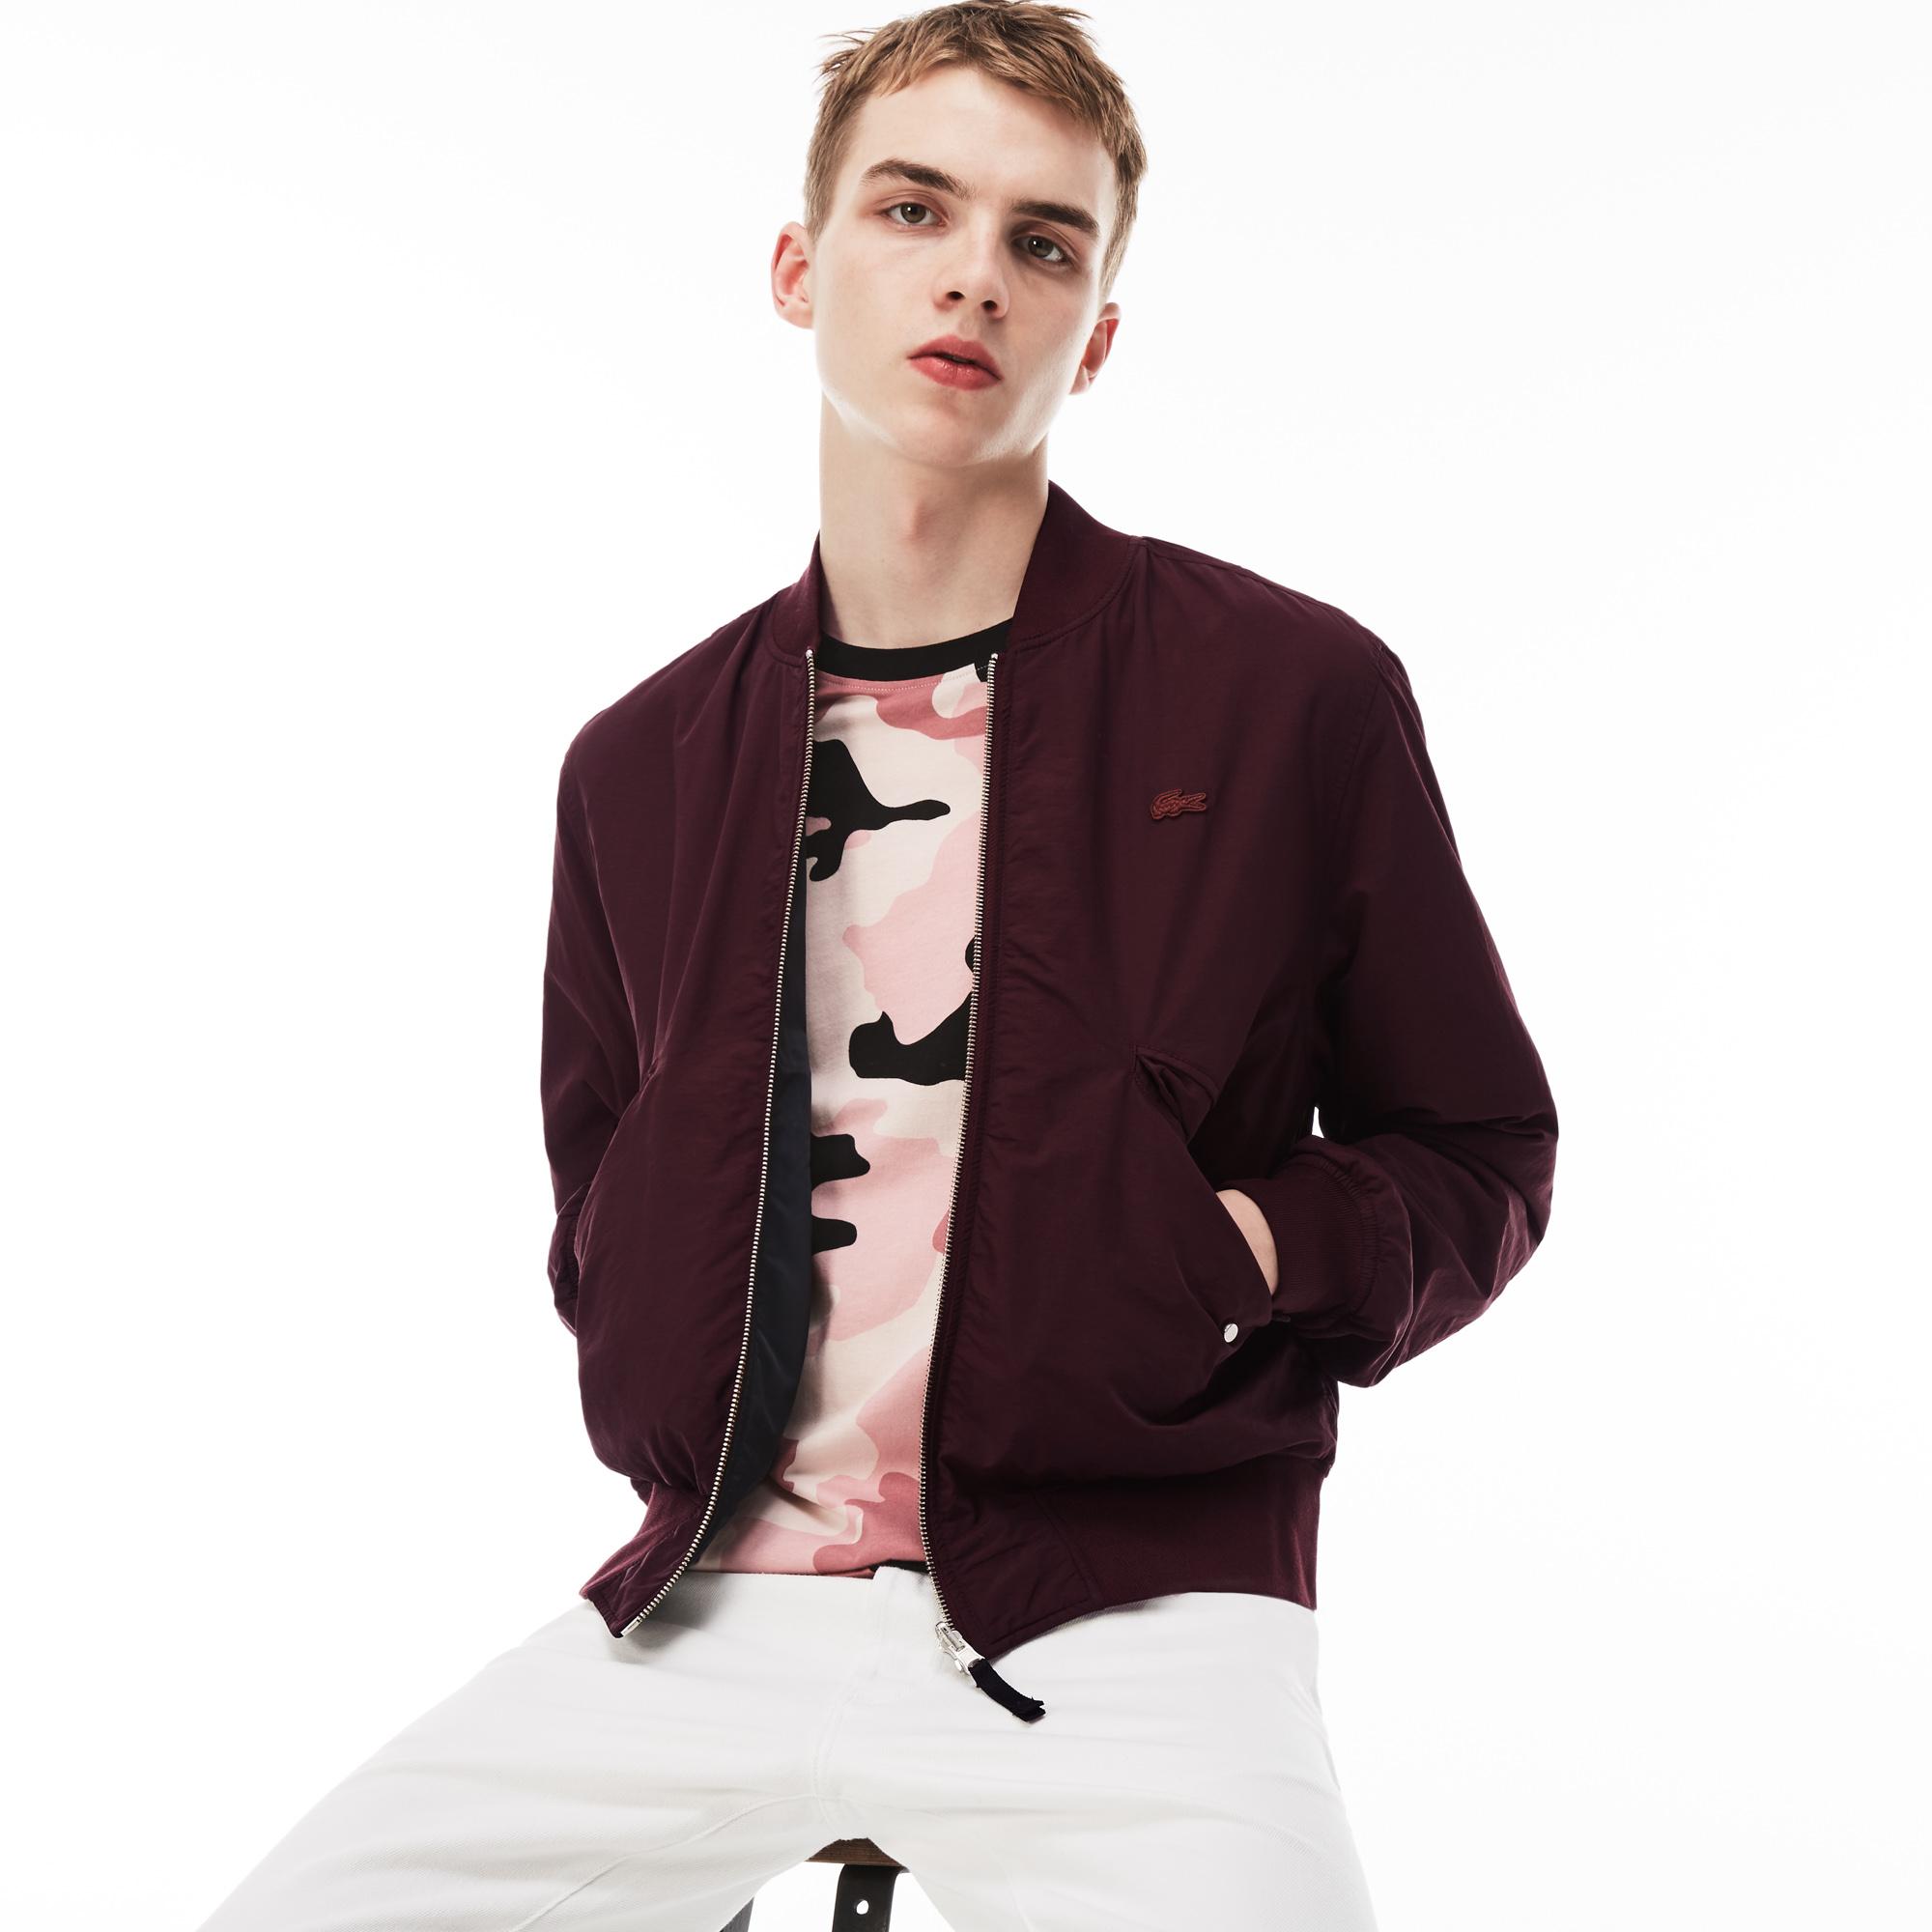 Куртка LacosteВерхняя одежда<br>100% полиамид 100% полиэстер 97% полиэстер 3% эластан 100% нейлон